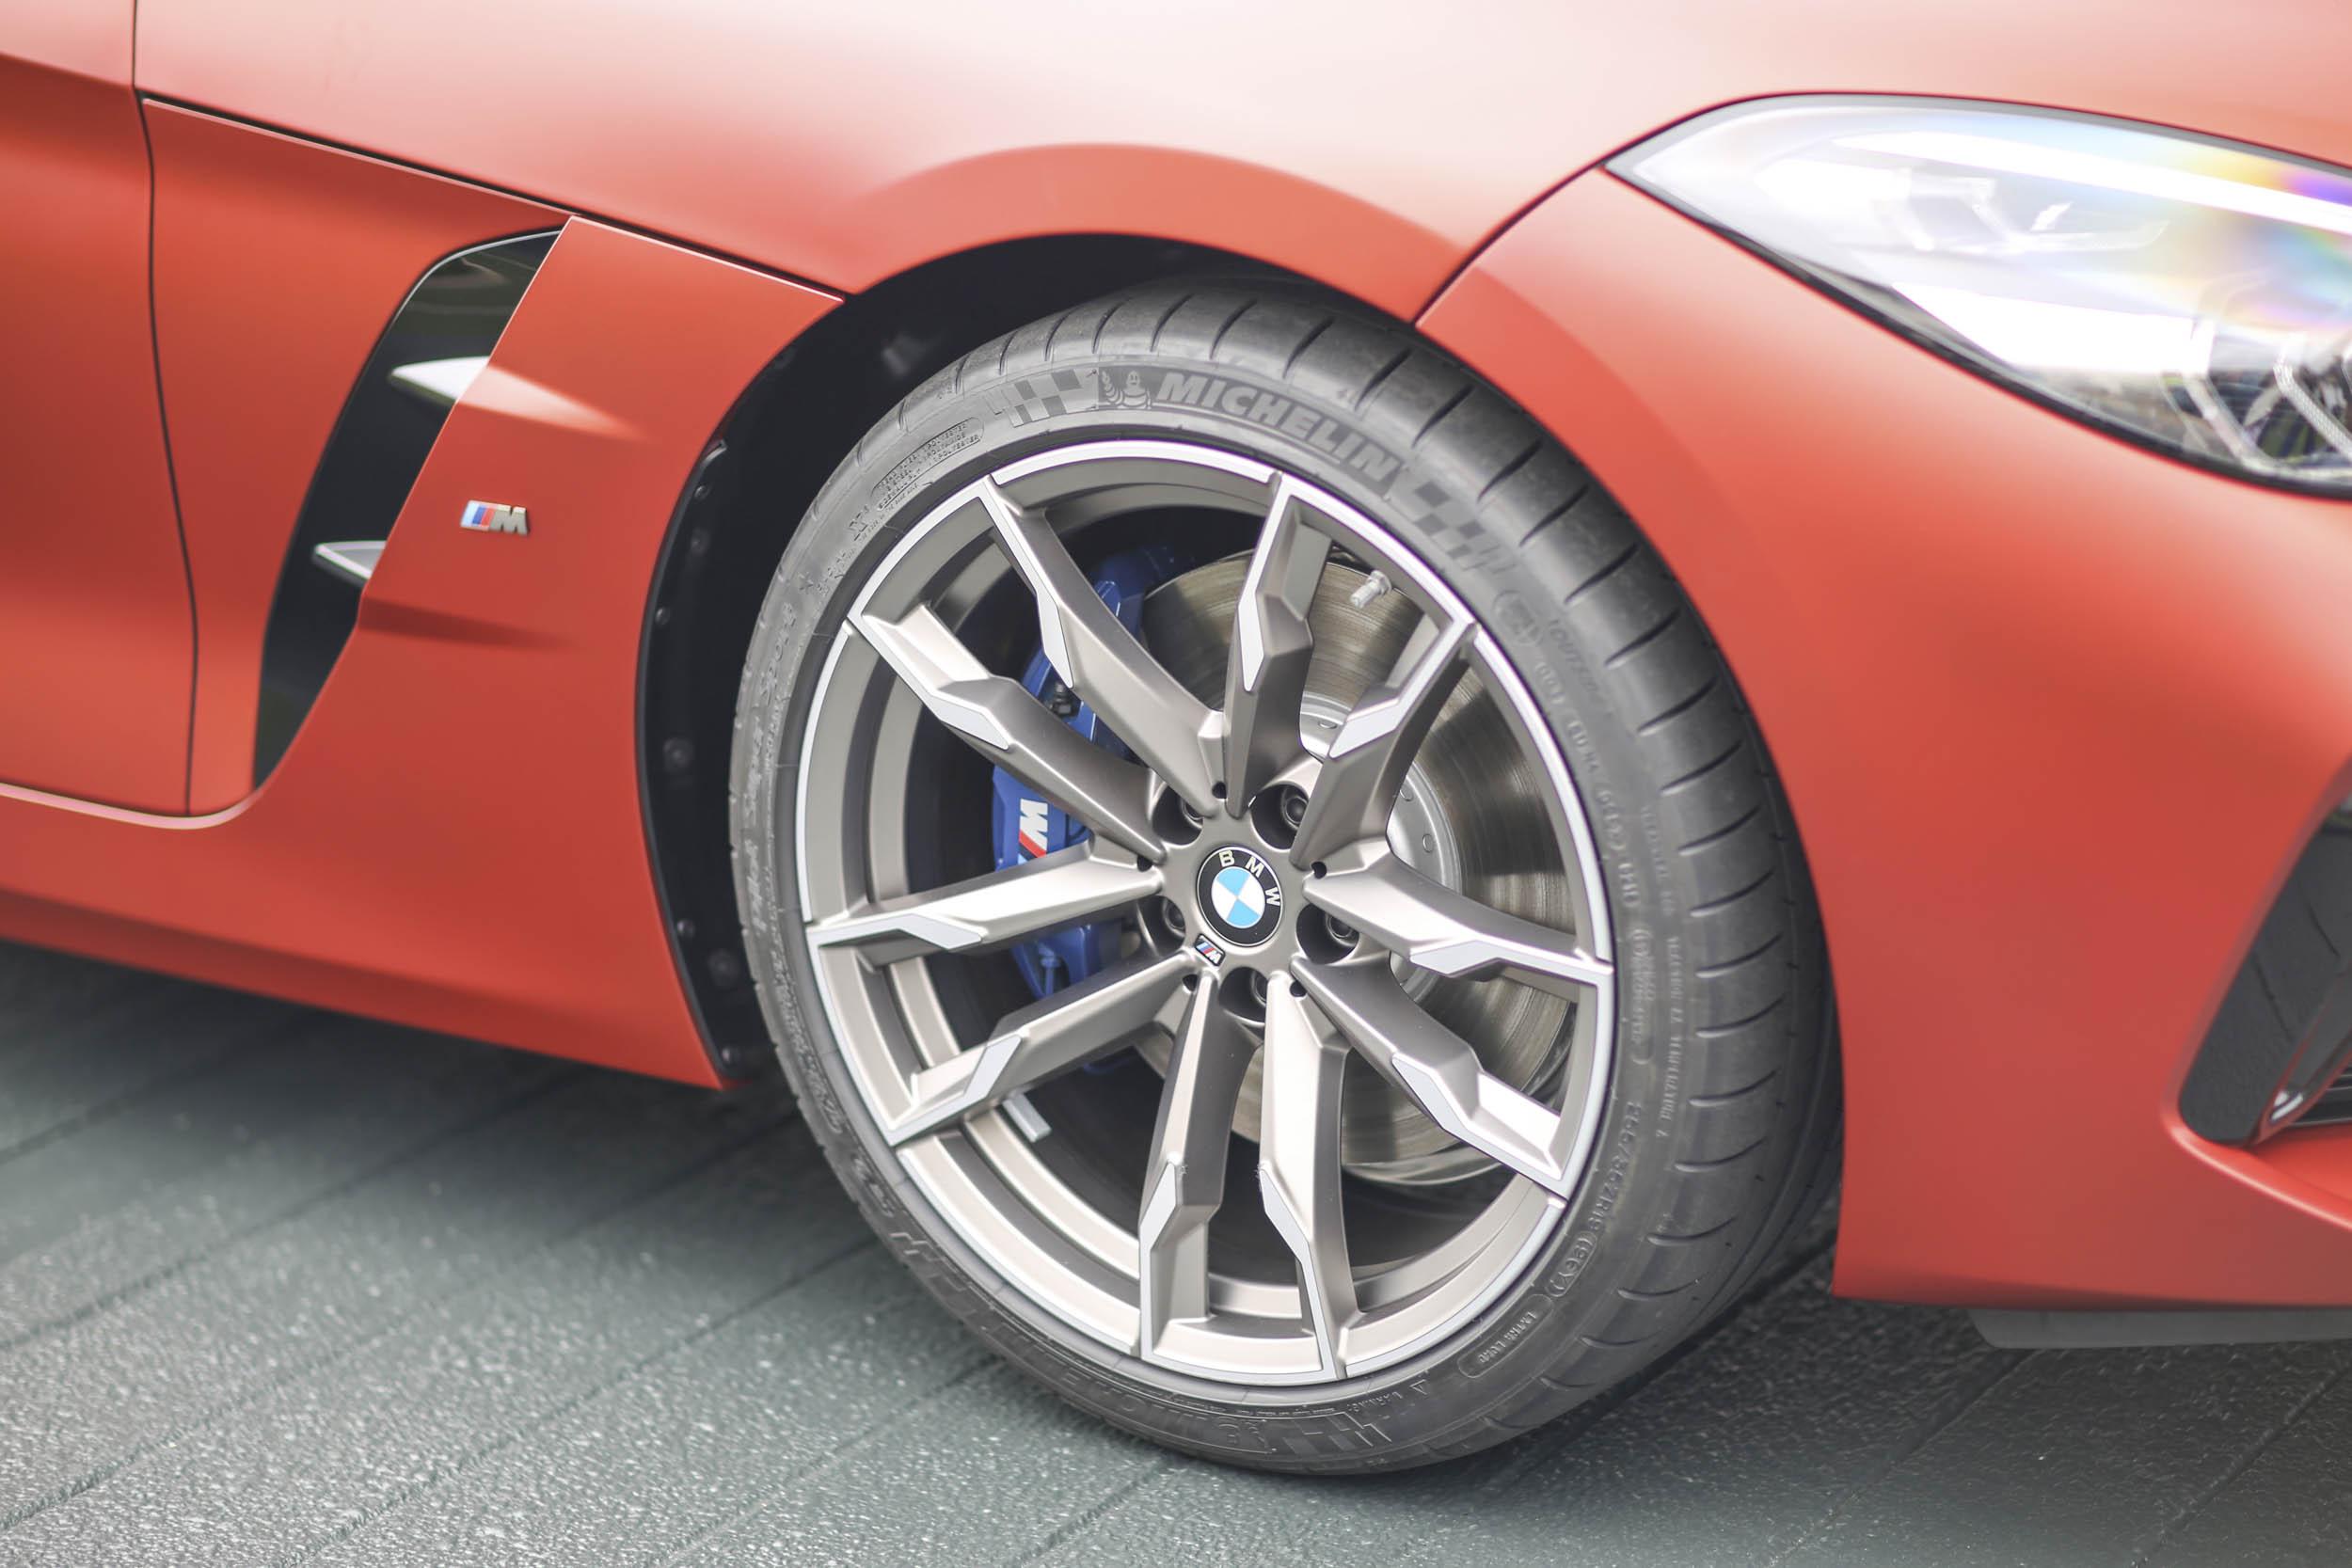 BMW Z4 M40i roadster wheel detail